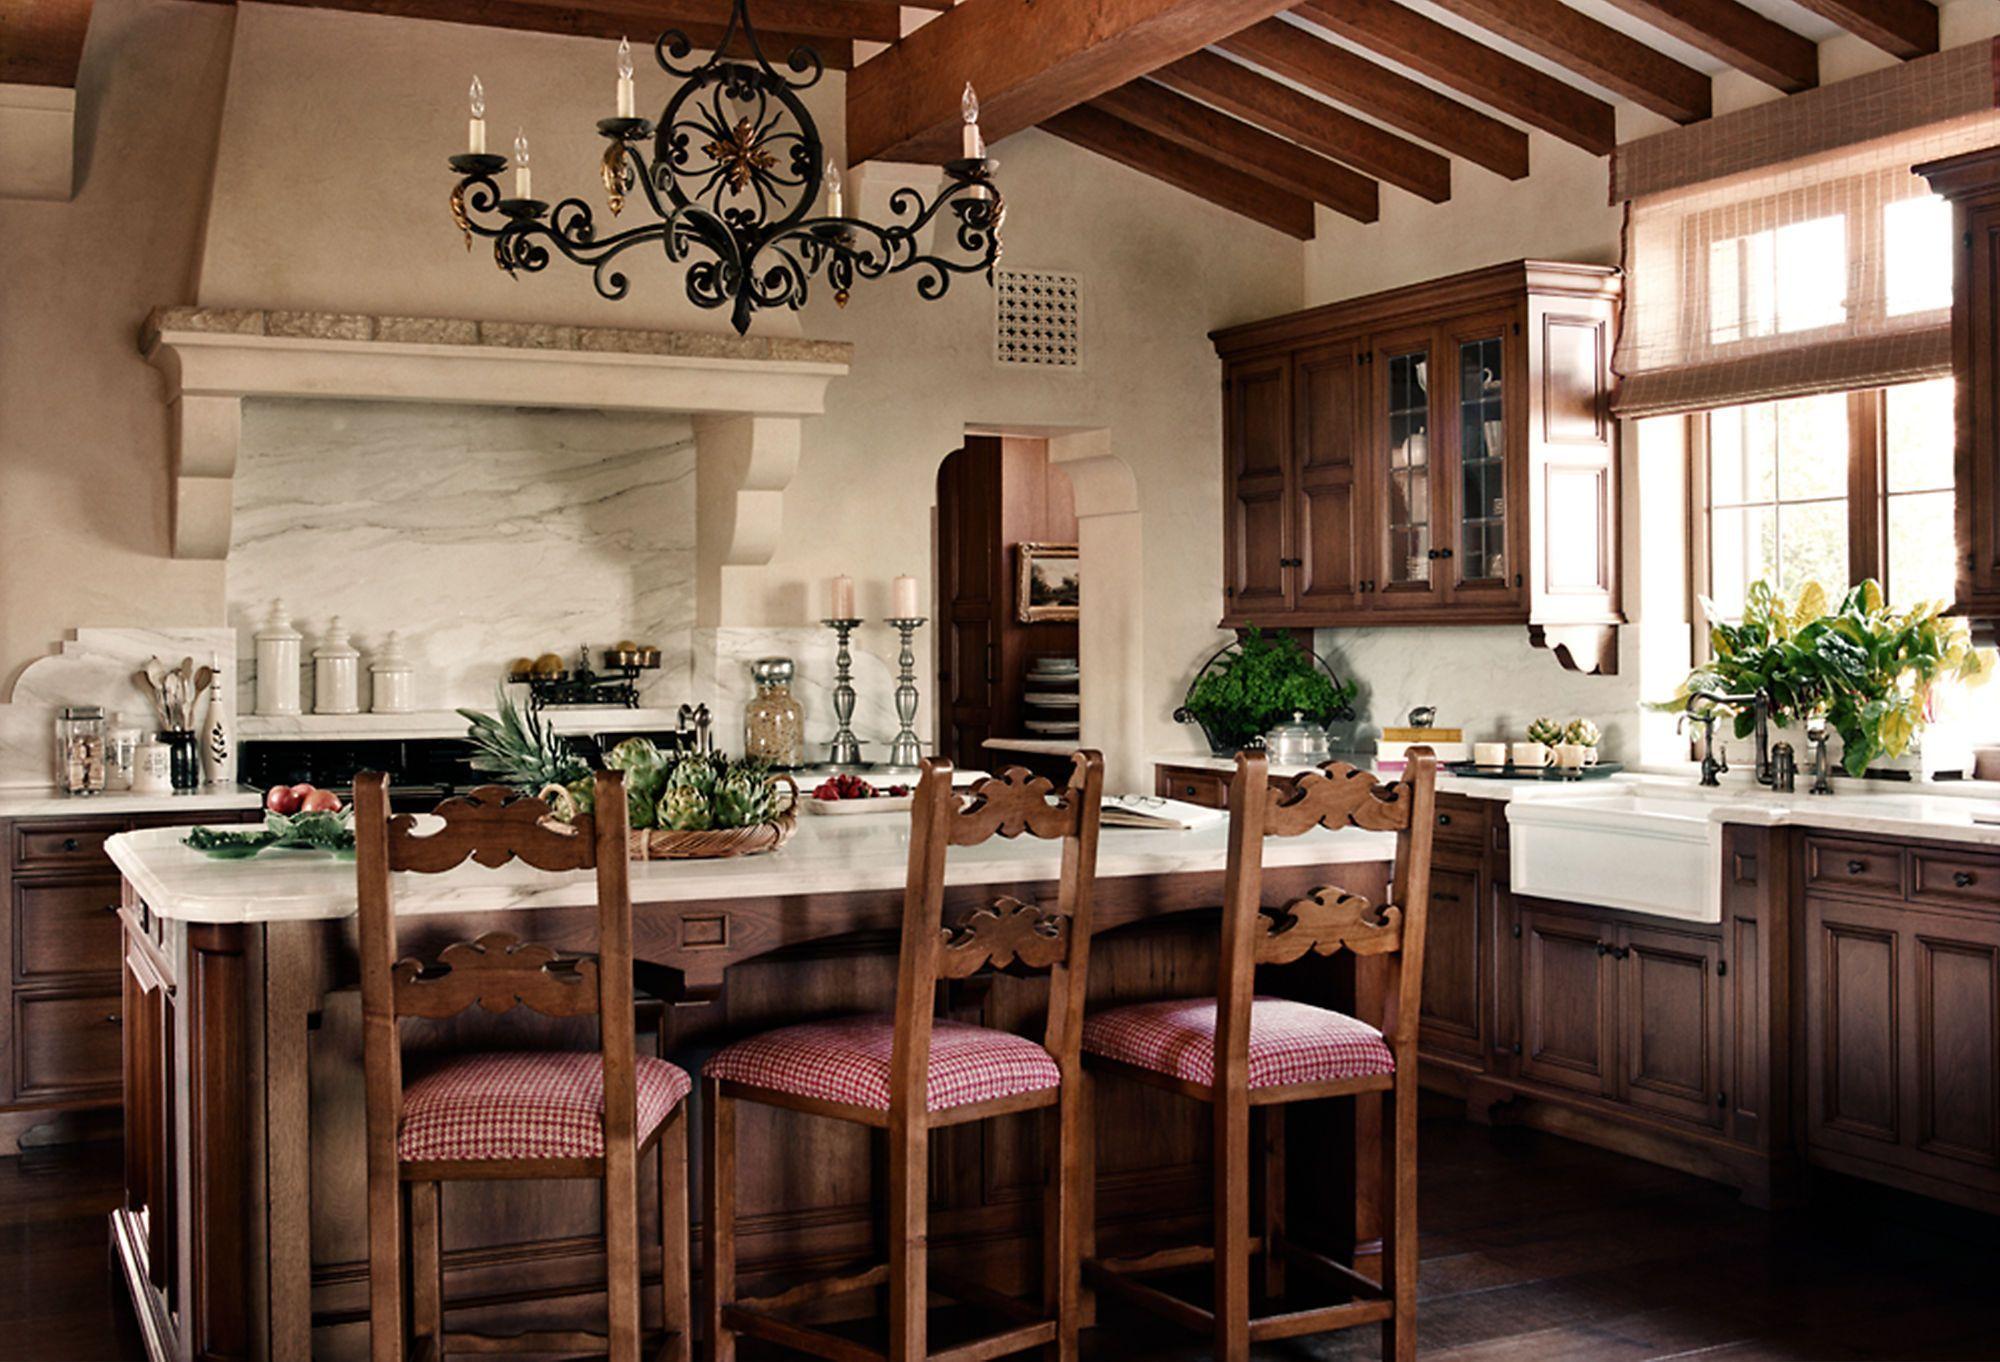 Places to Gather: A Hacienda Kitchen   Country kitchen ...